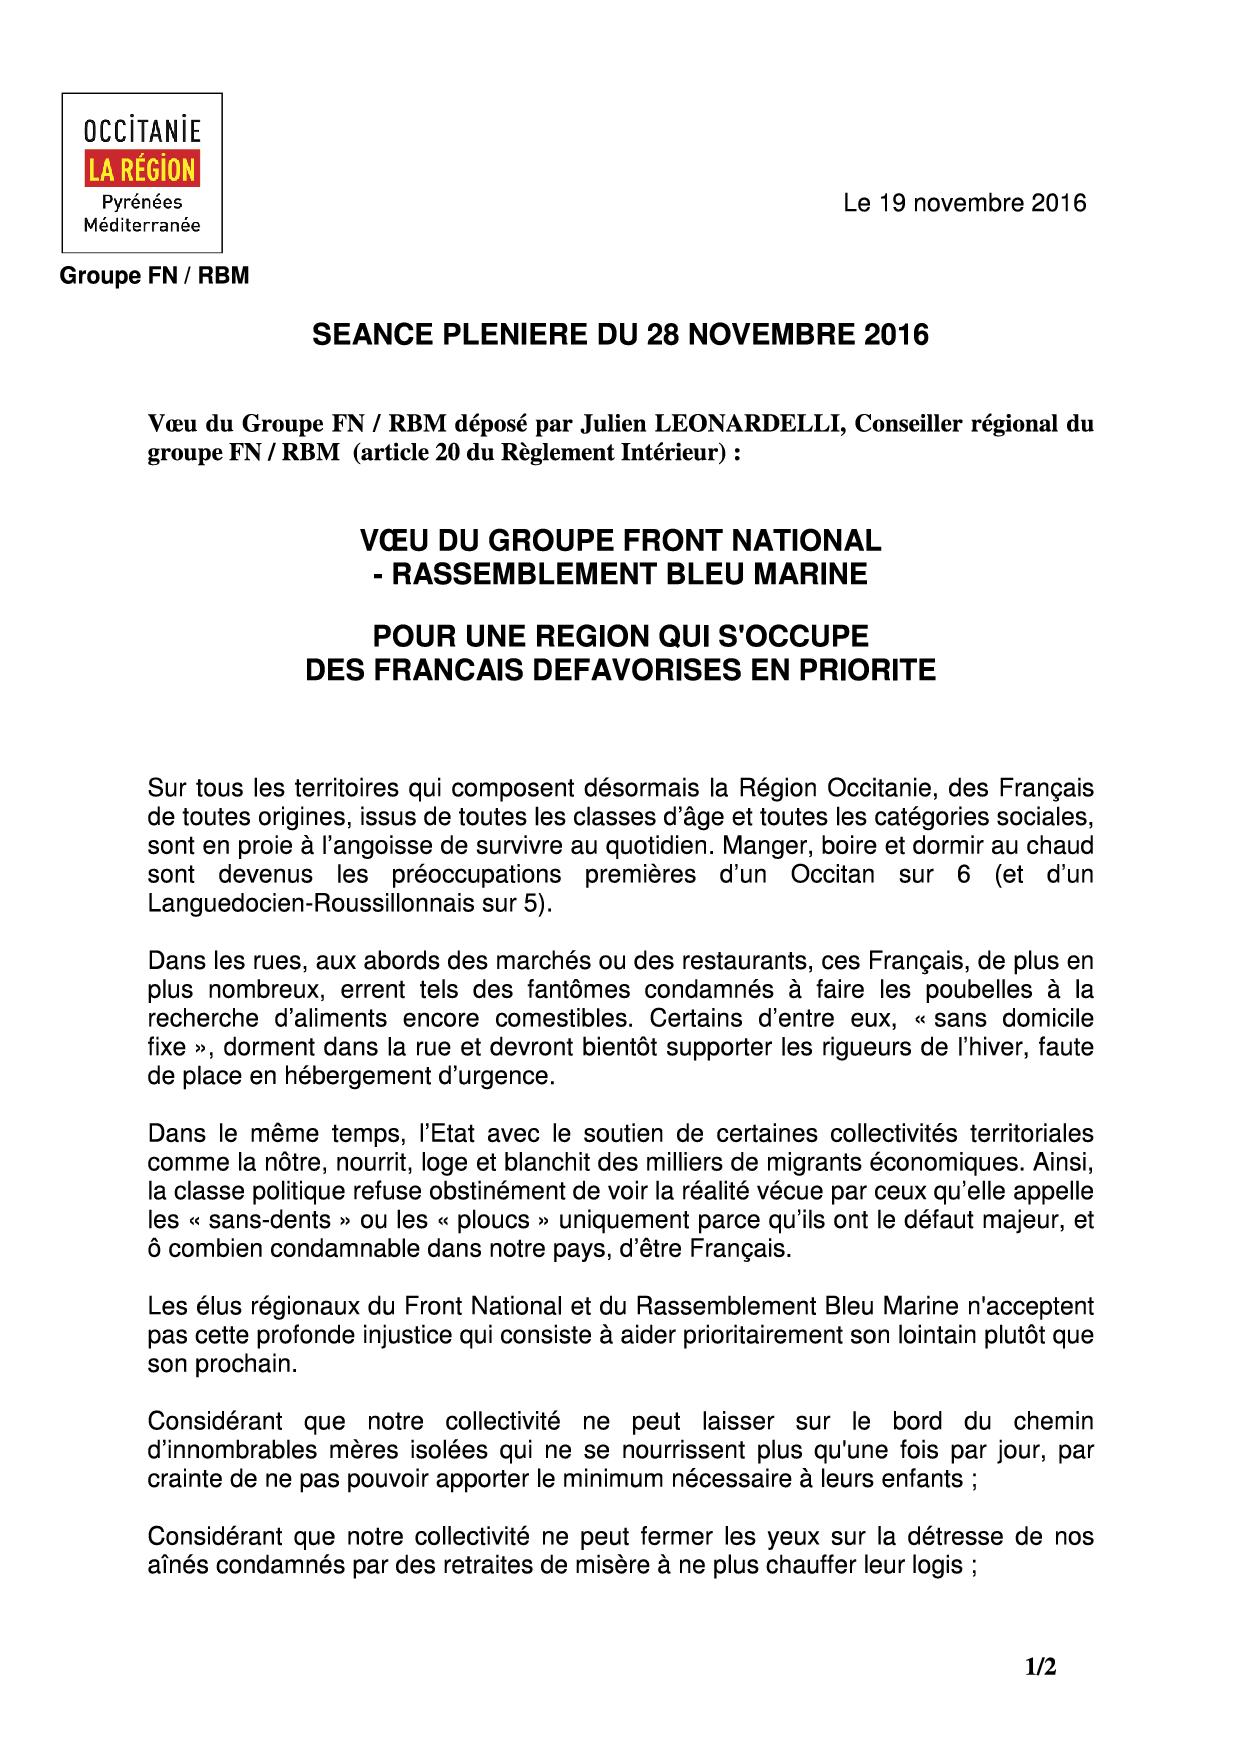 occitanie_voeu_leonardelli_priorite_nationale_fn_p1